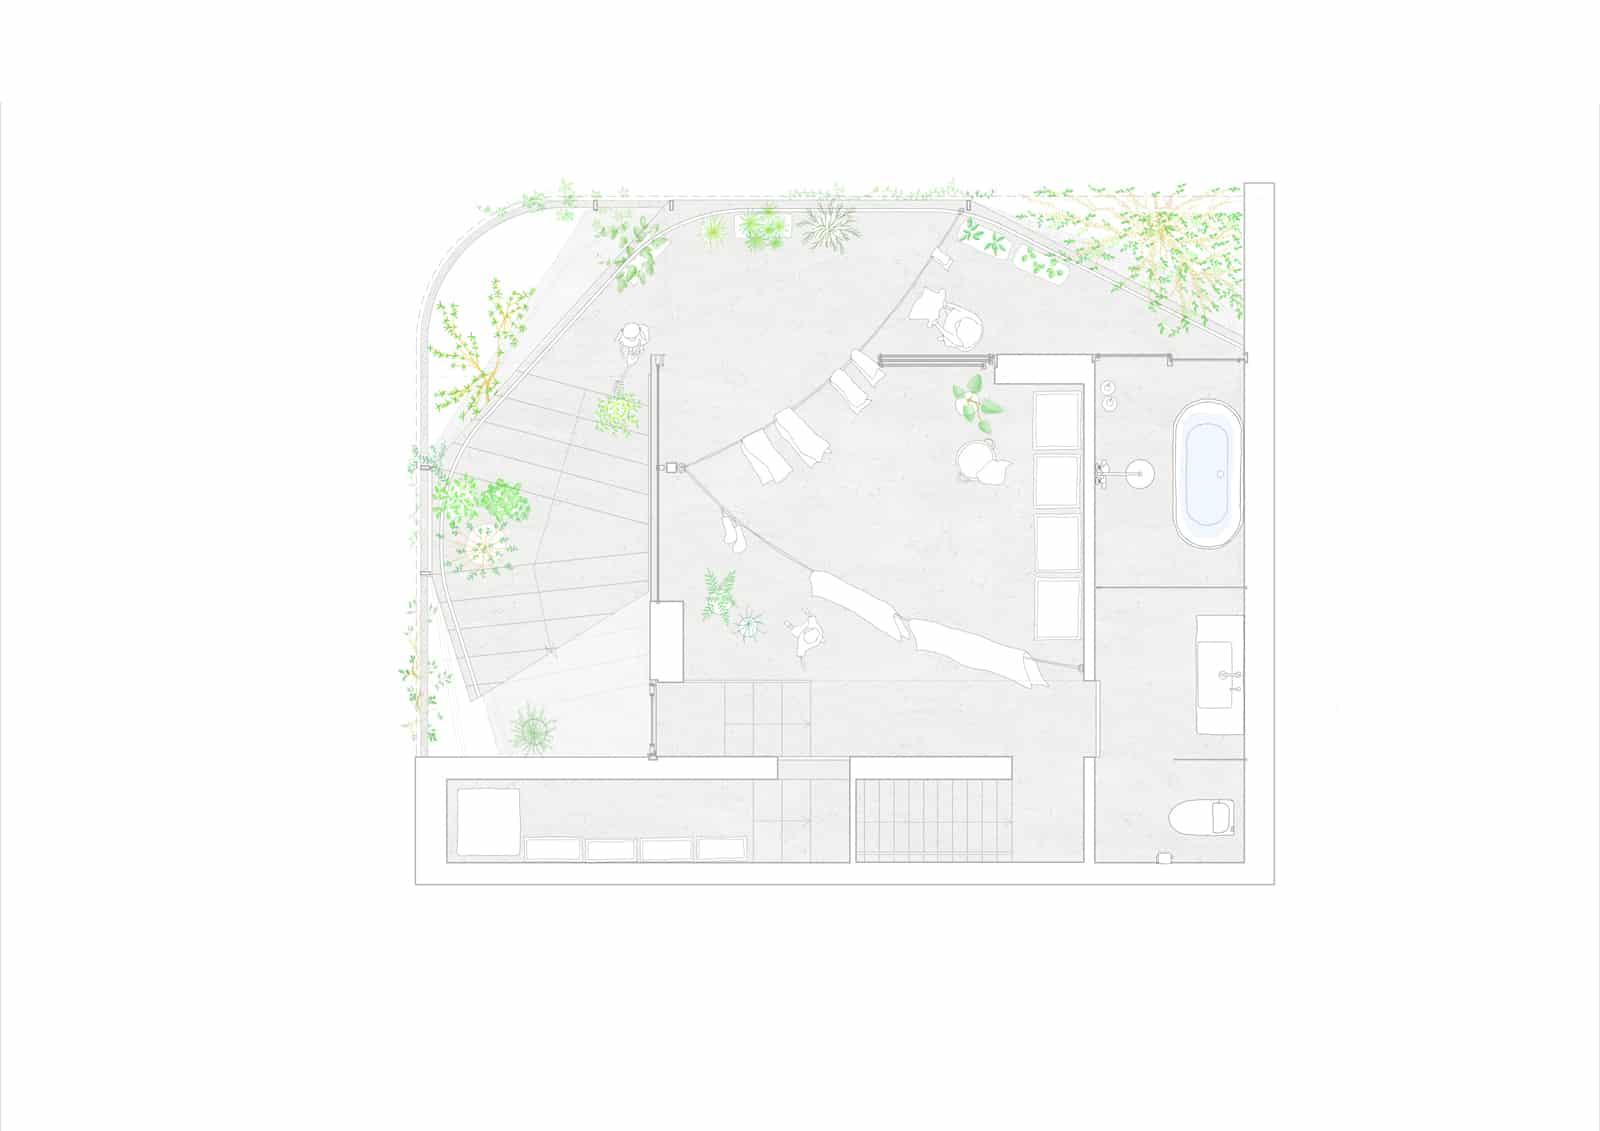 Weather House  - 20210827 NotArchitecsStudio WeatherHouse 11.3 60